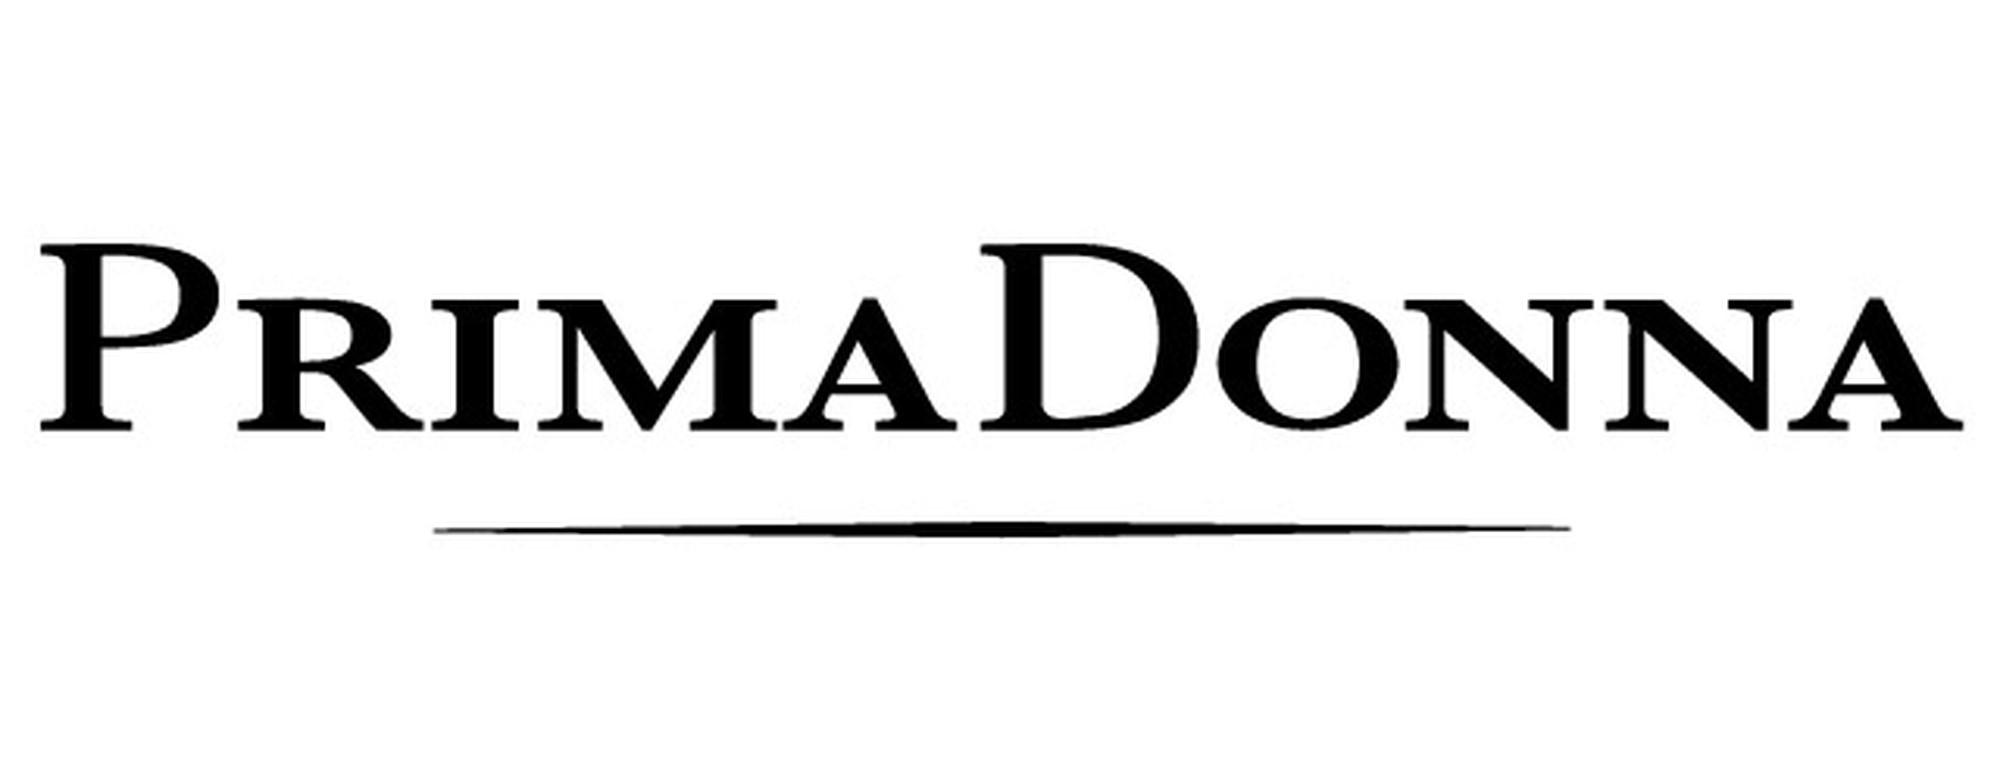 PrimaDonna Shapewear